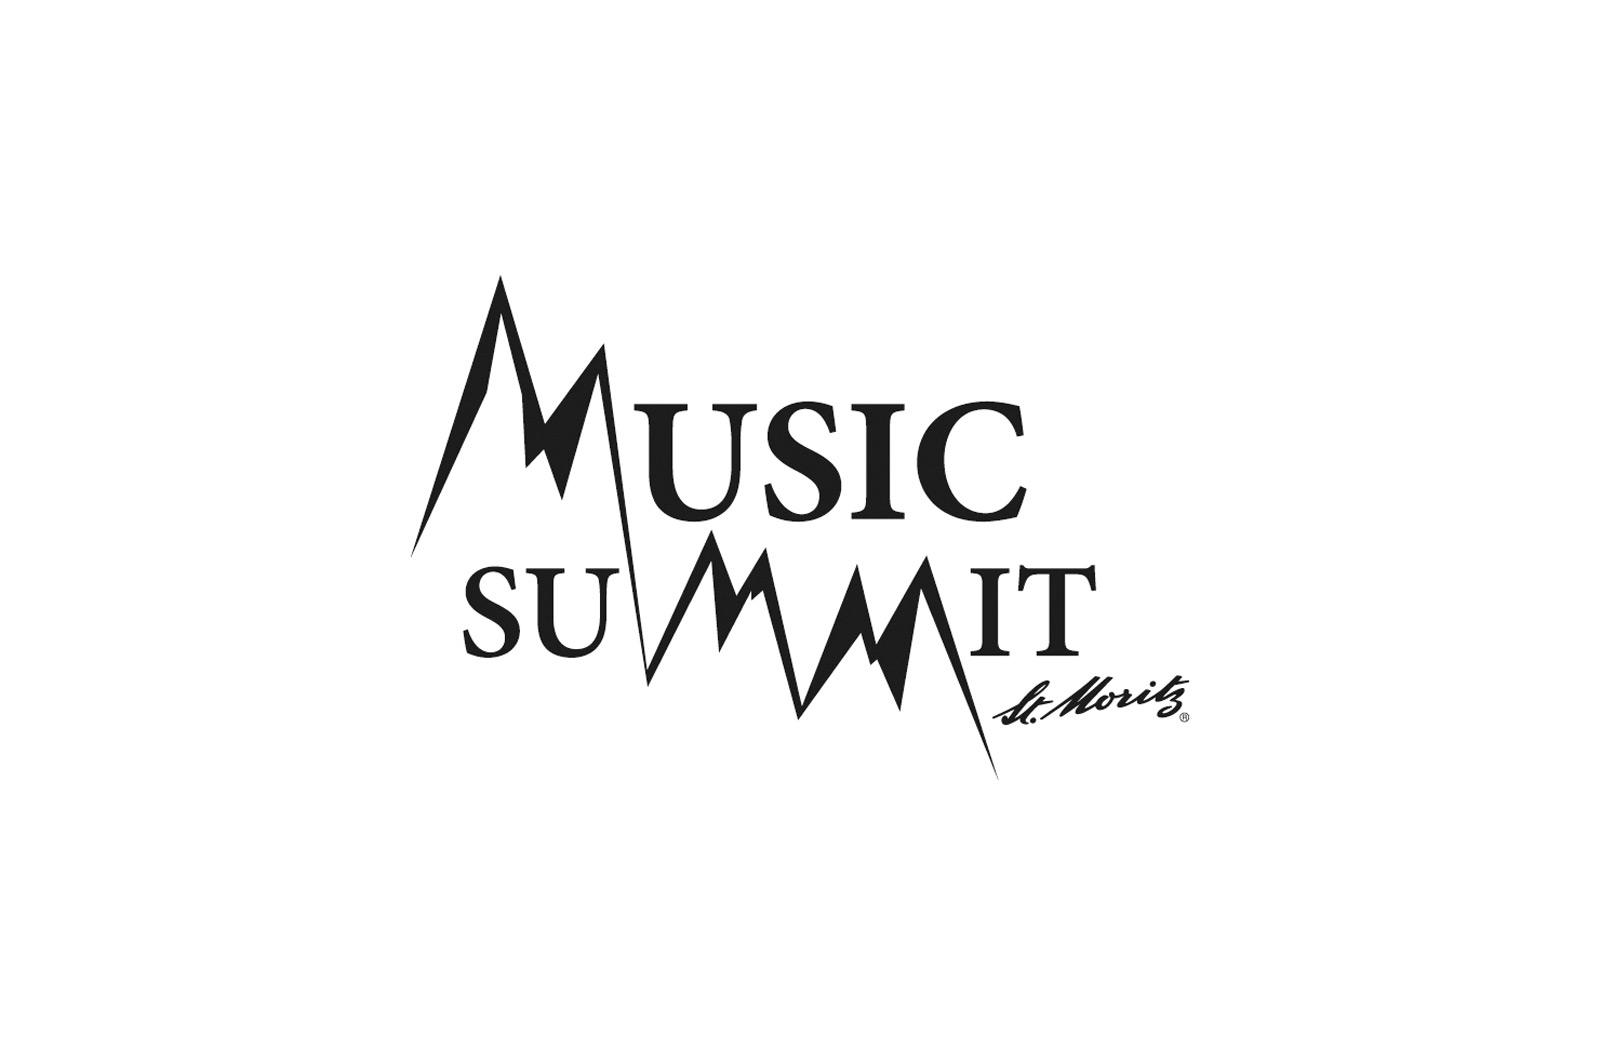 EMERALD MUSIC SUMMIT